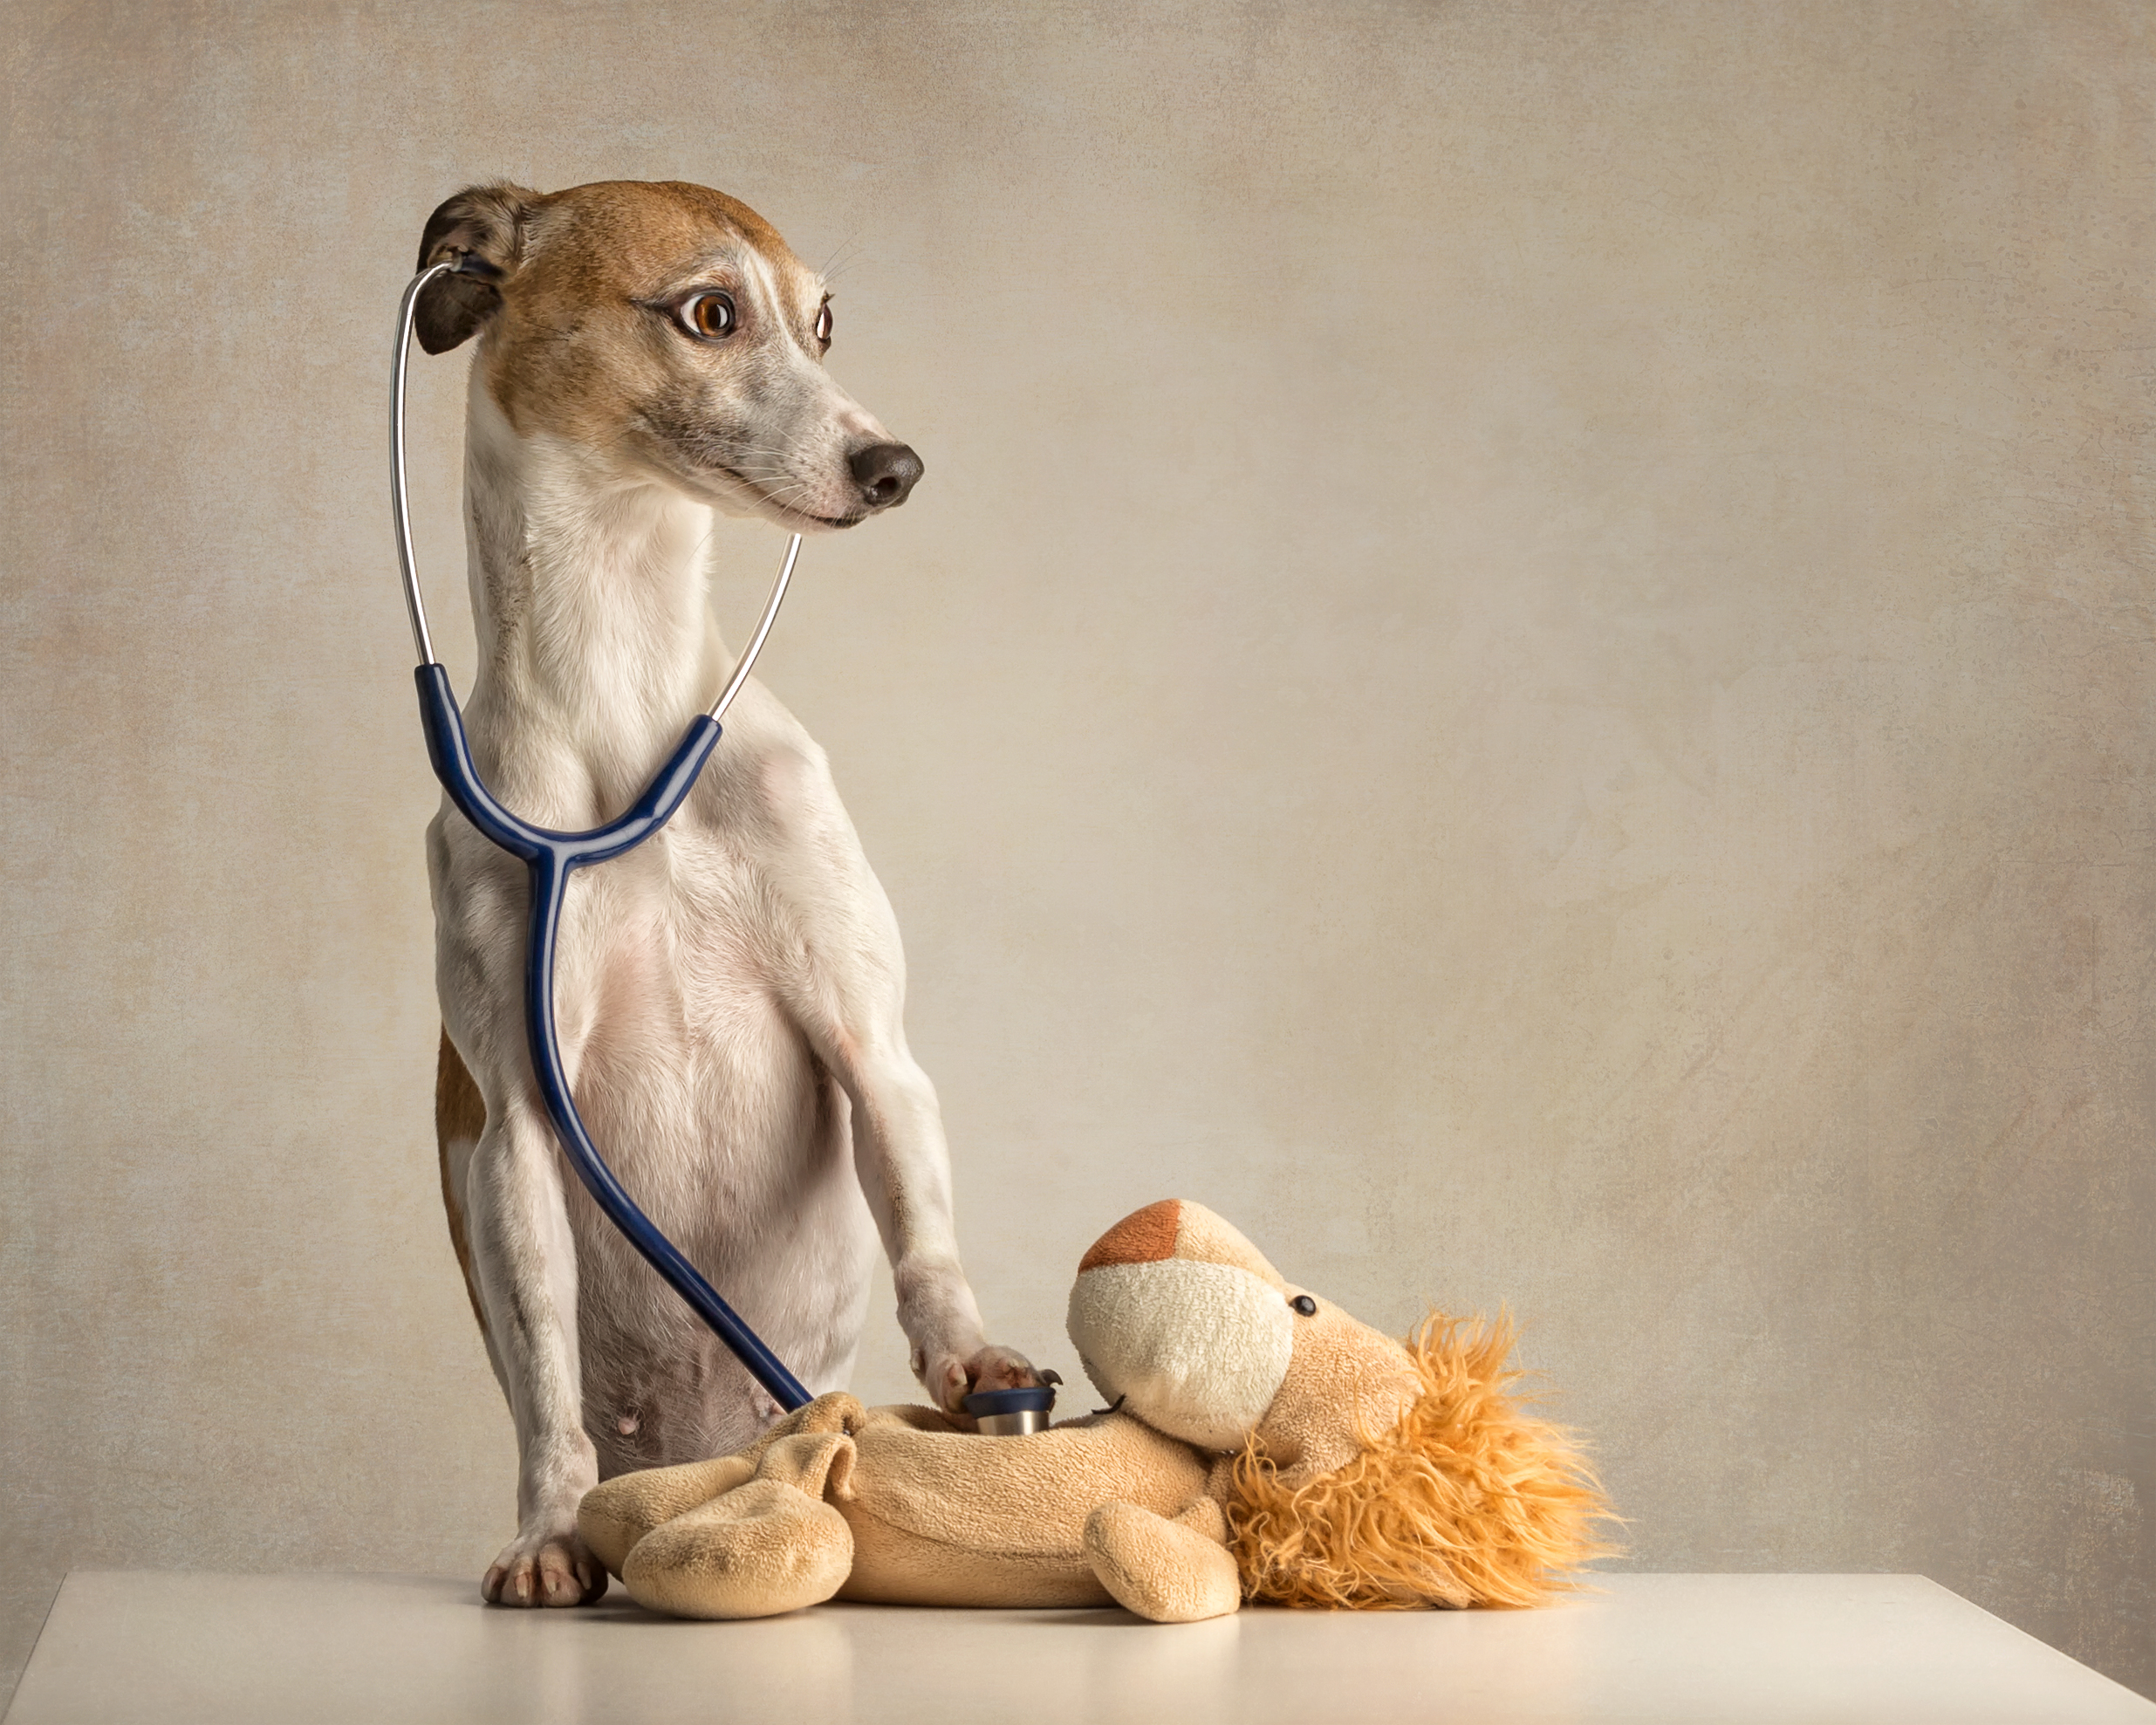 Dog with Stethoscope.jpg